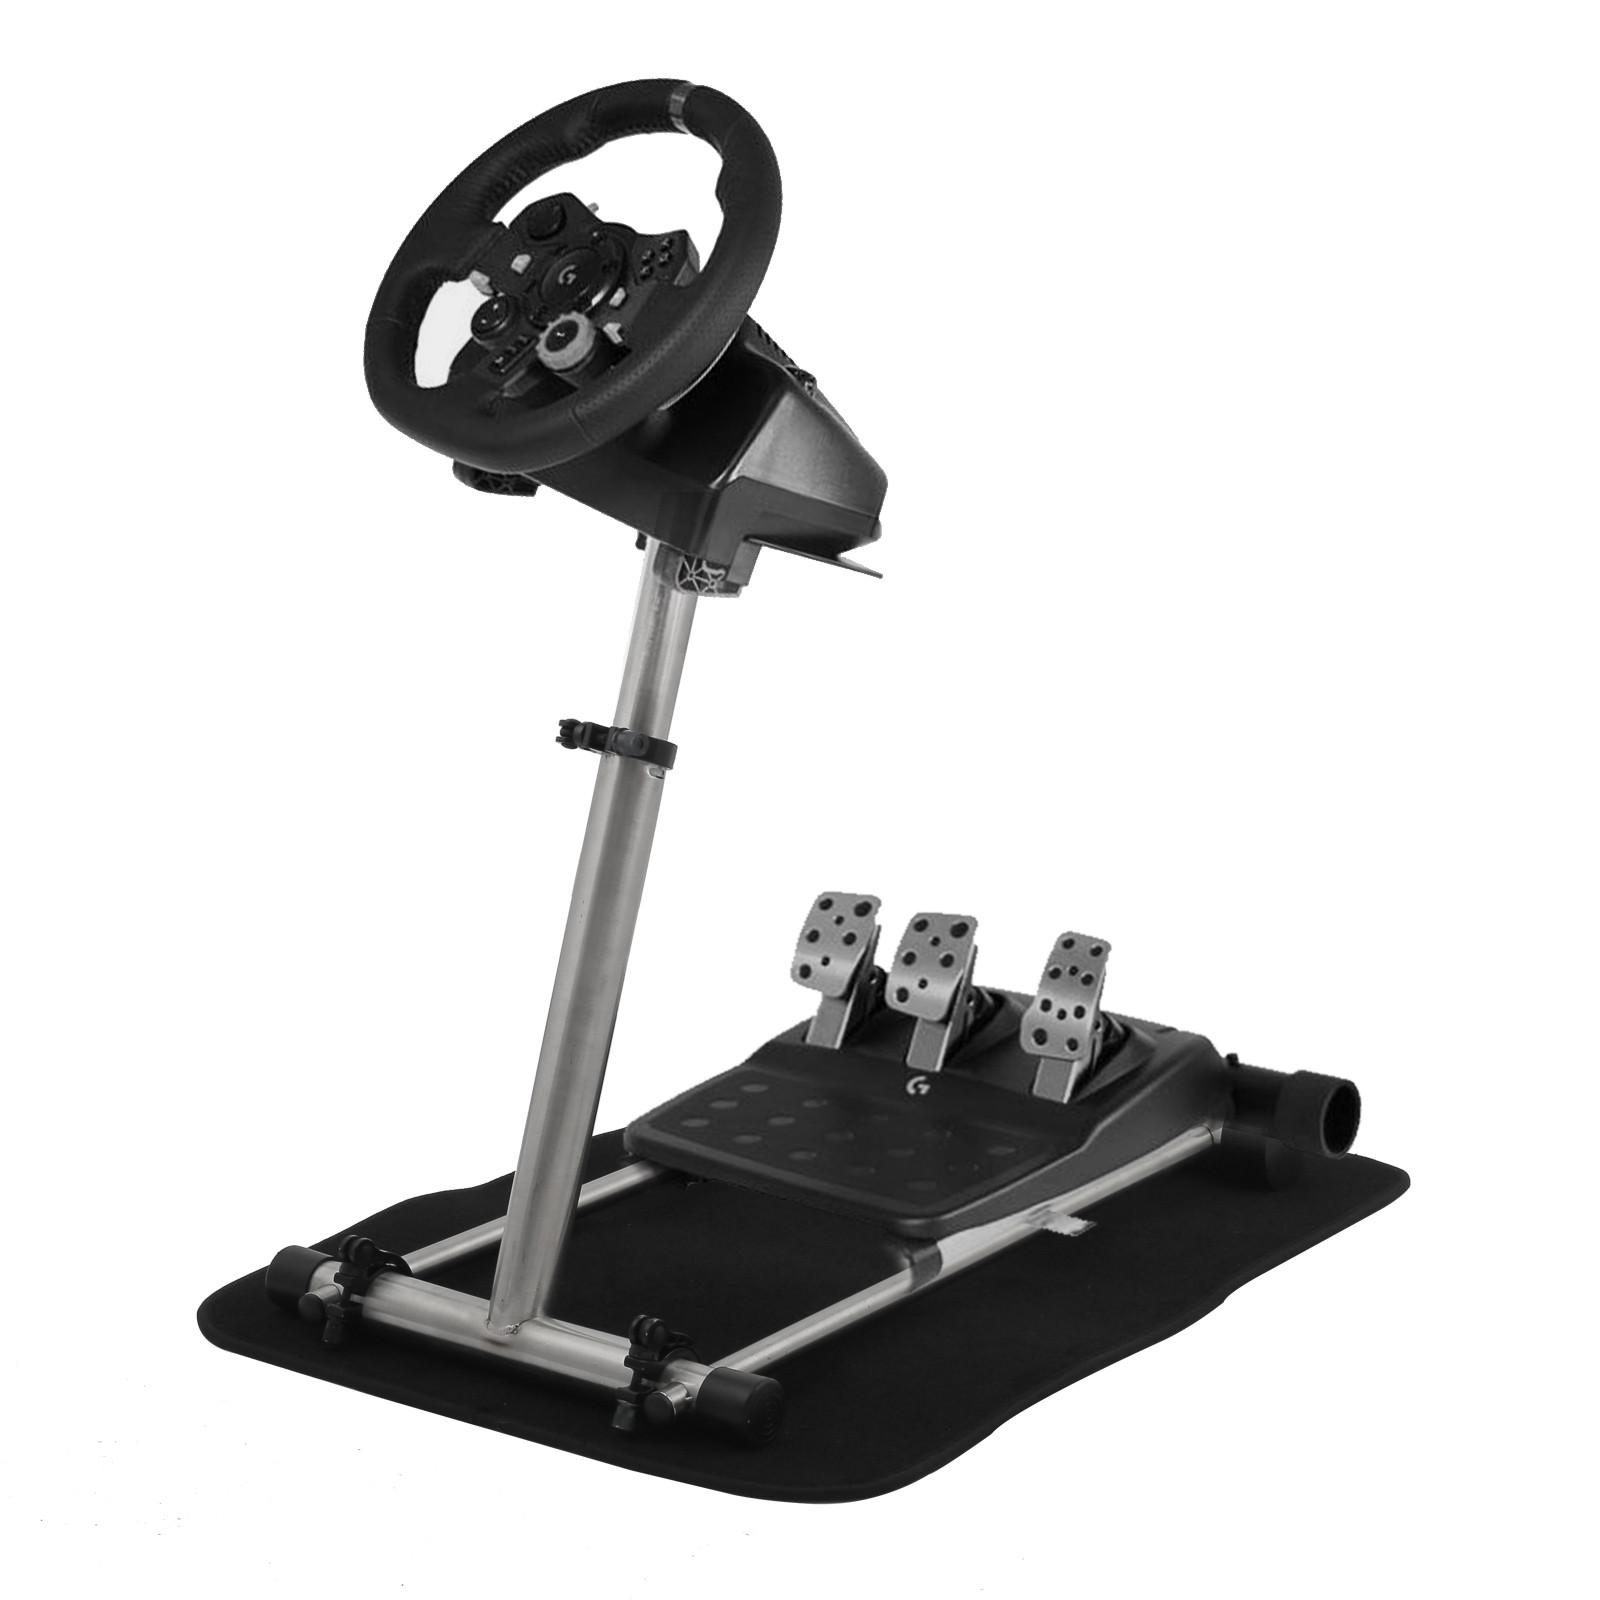 Volante Soporte rueda carrera Logitech Thrustmaster G29/G920 jeux vidéo